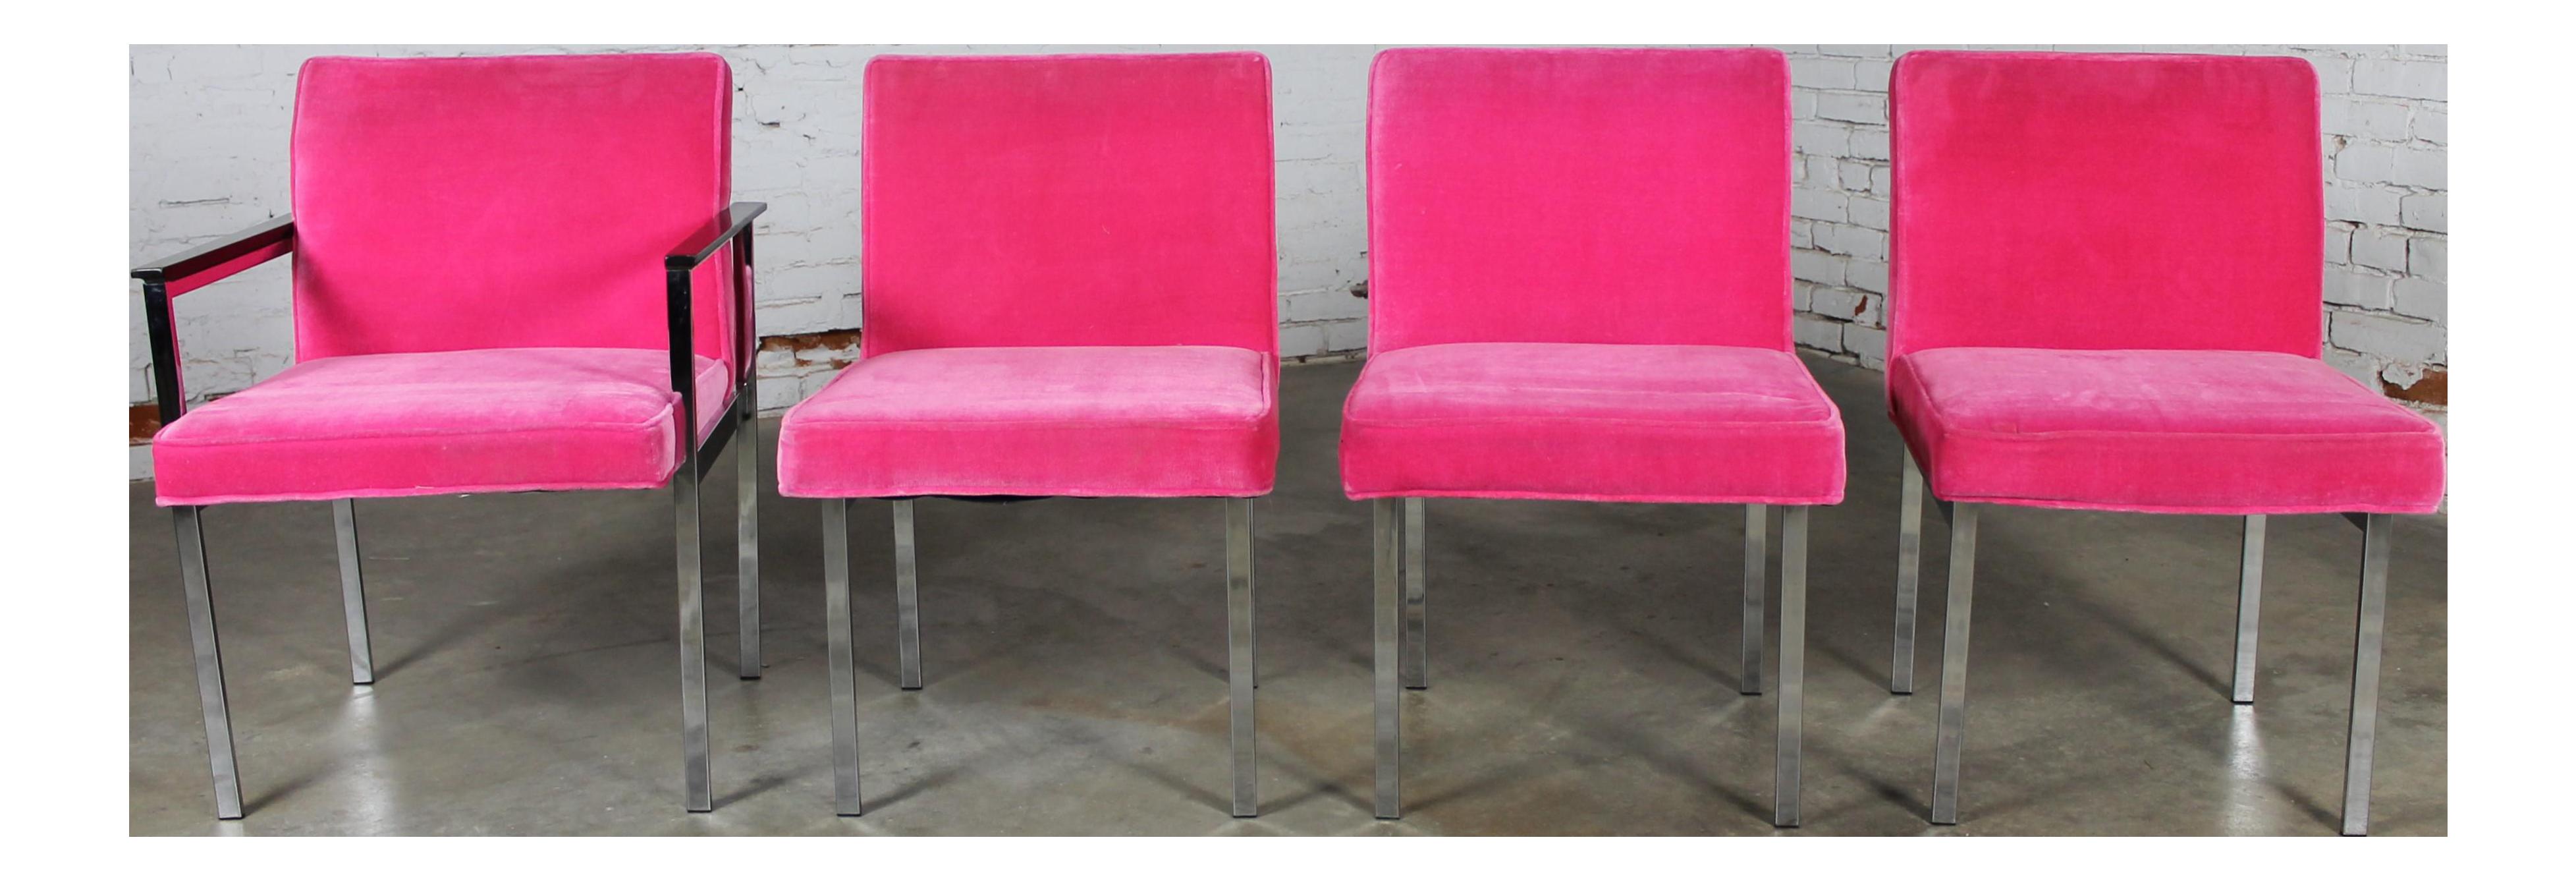 Vintage American of Martinsville Mid Century Modern Hot Pink